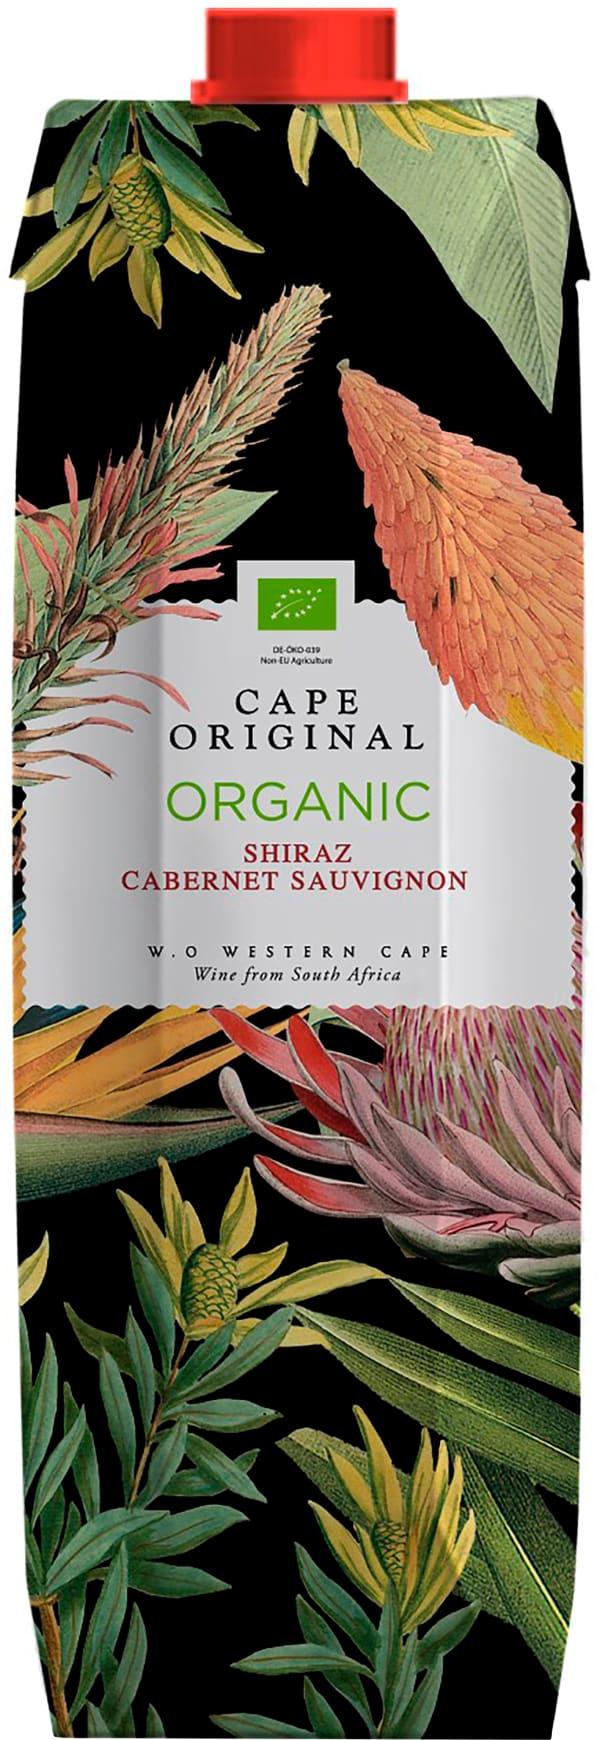 Cape Original Shiraz Cabernet Sauvignon Organic 2016 carton package